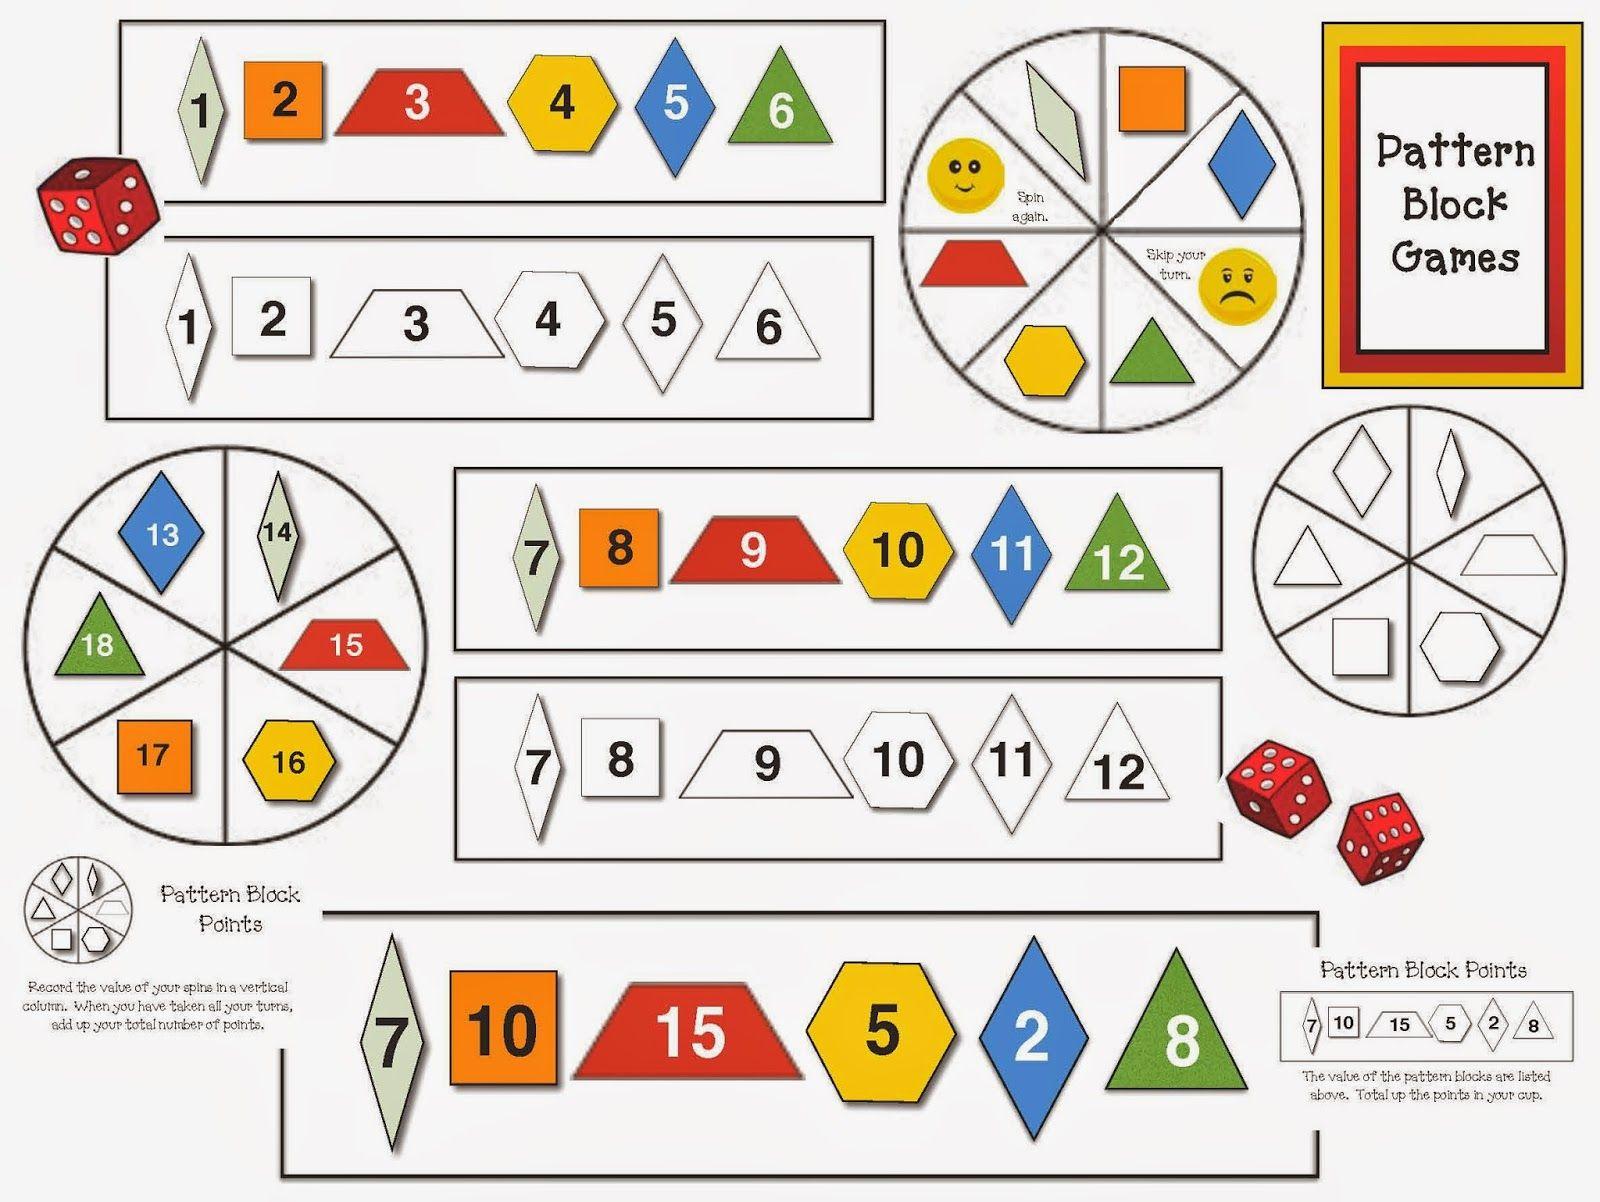 Pattern Block Games Pattern Blocks Activities Pattern Blocks